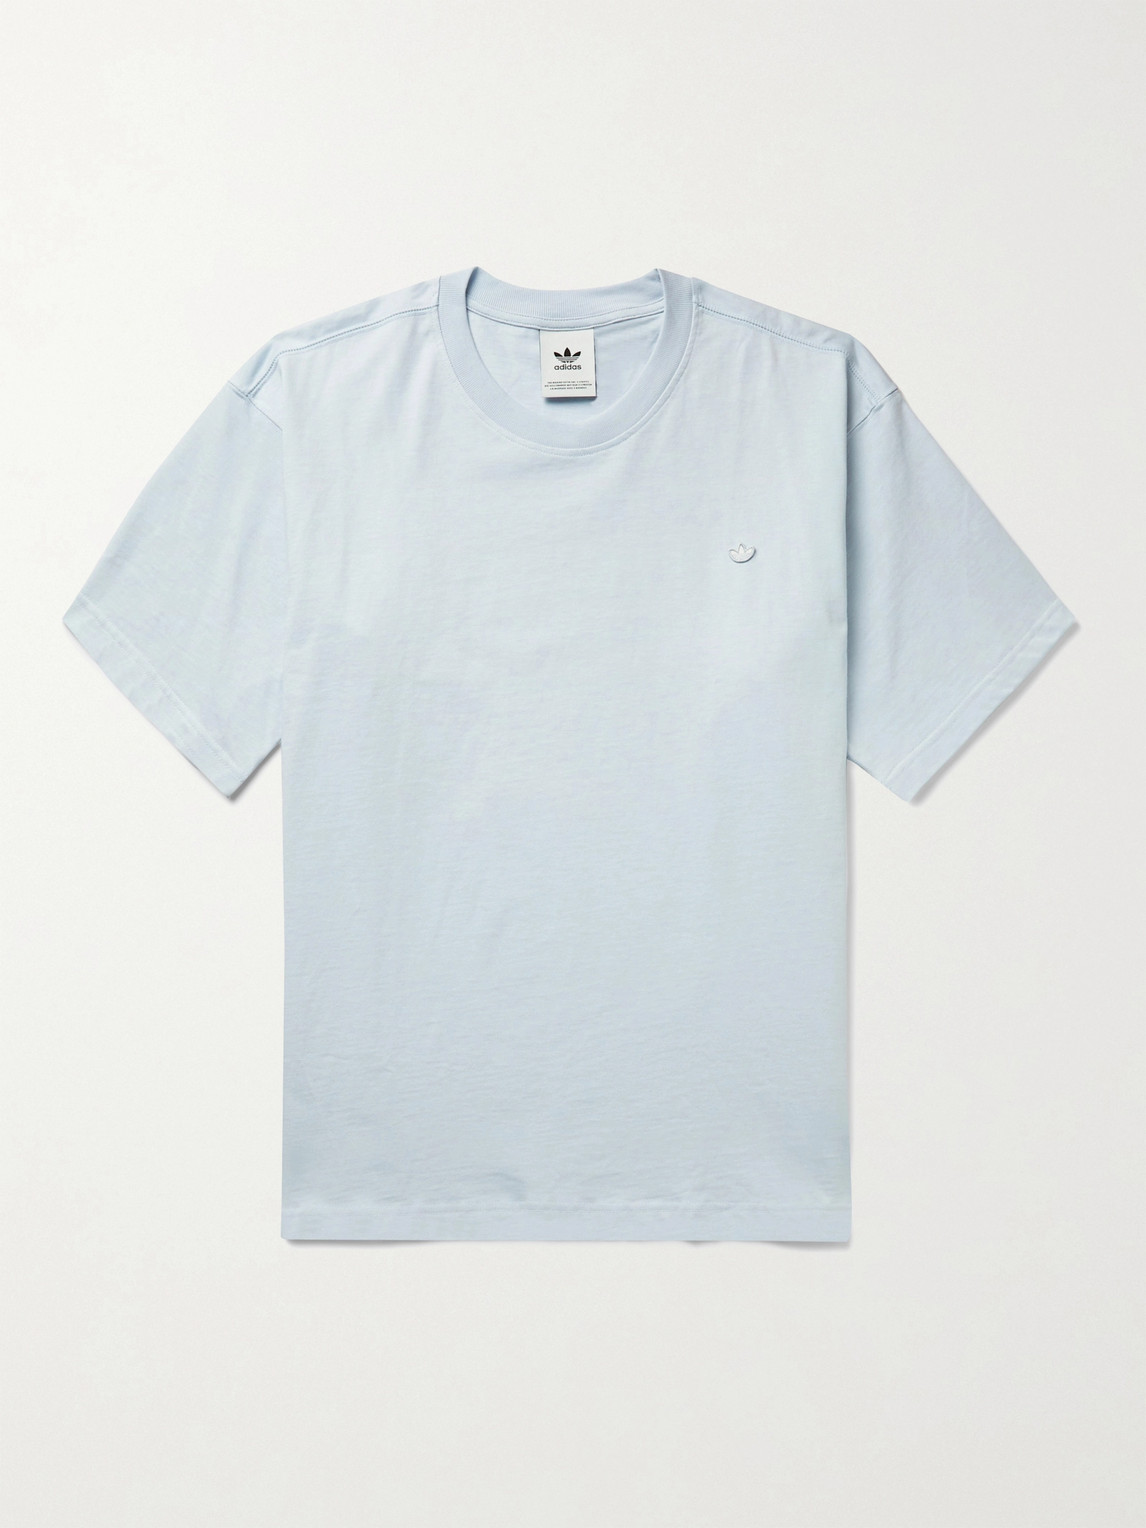 Adidas Originals Cottons ADICOLOR PREMIUM LOGO-APPLIQUÉD ORGANIC COTTON-JERSEY T-SHIRT